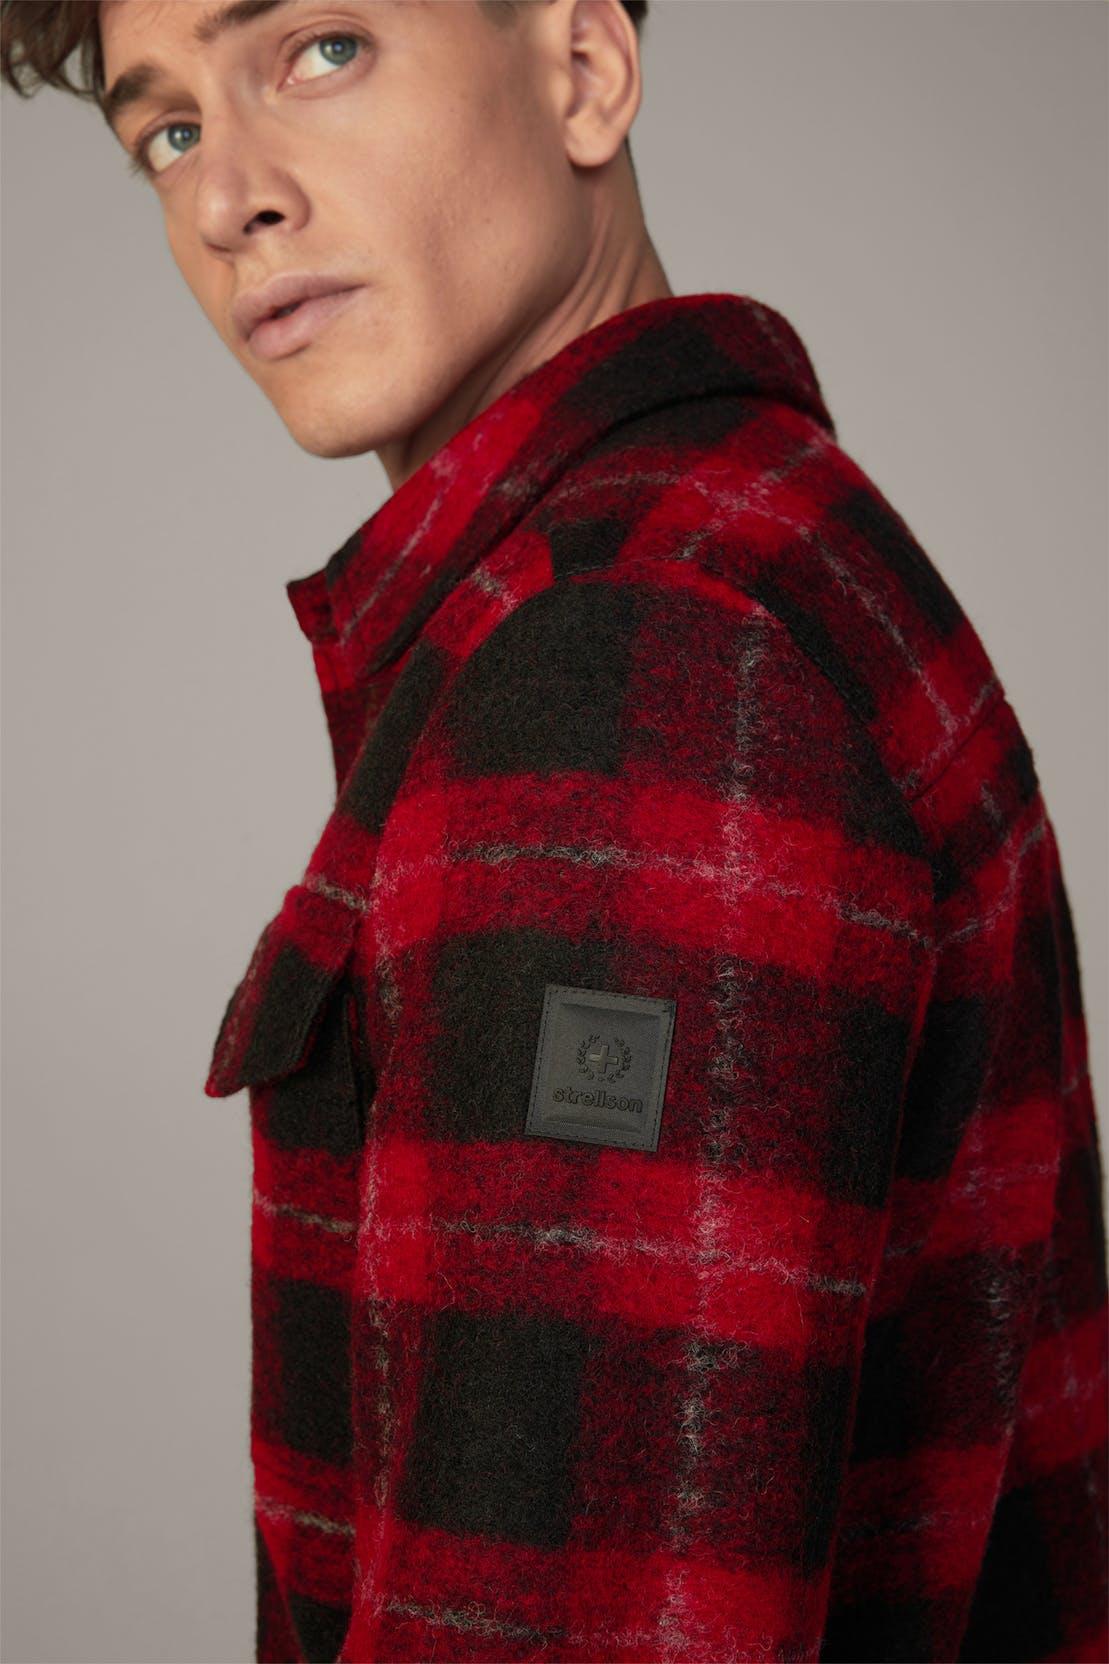 Hemdjacke Lumber, schwarz/rot kariert